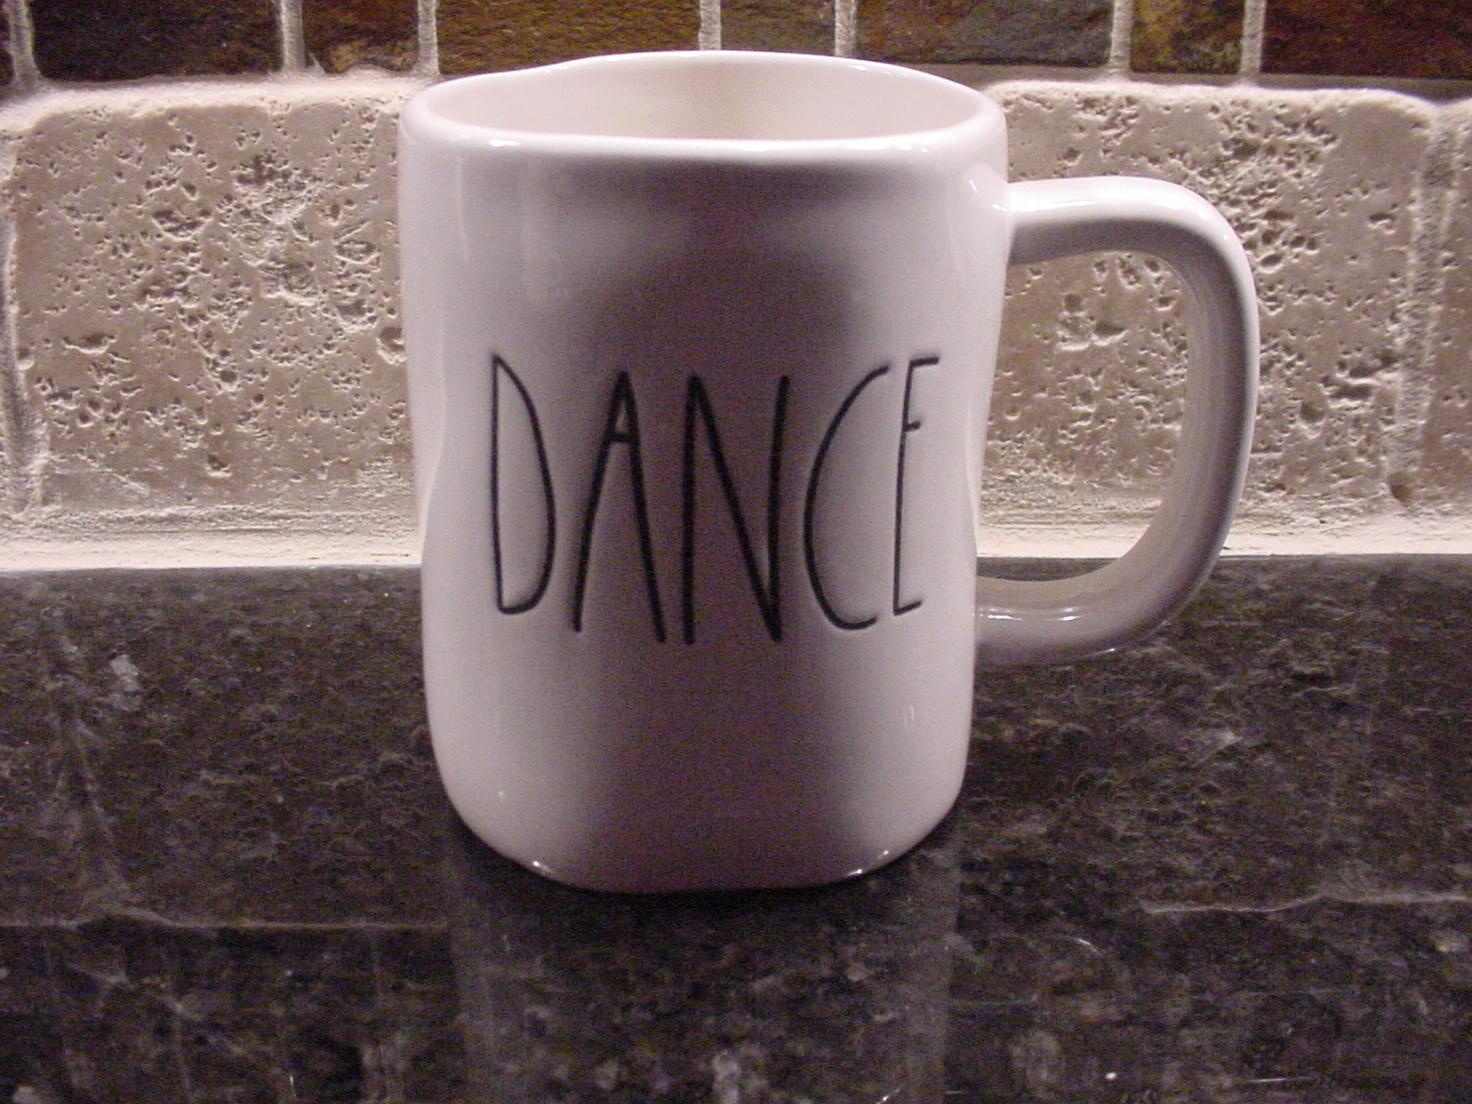 Rae Dunn DANCE Mug, Ivory with Black Lettering